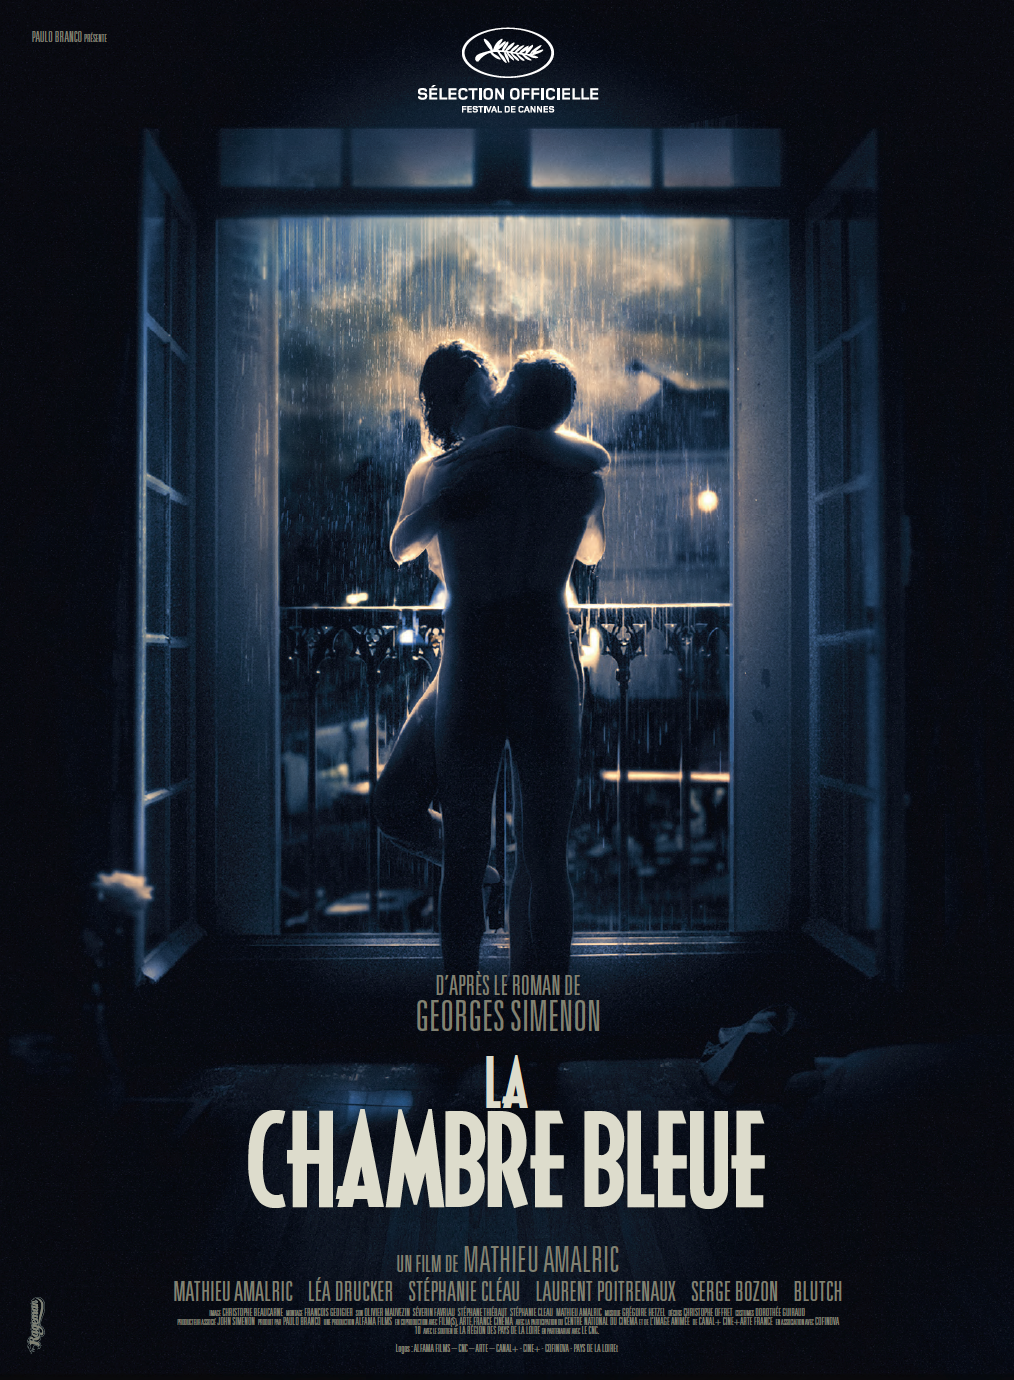 LA CHAMBRE BLEUE - POSTER